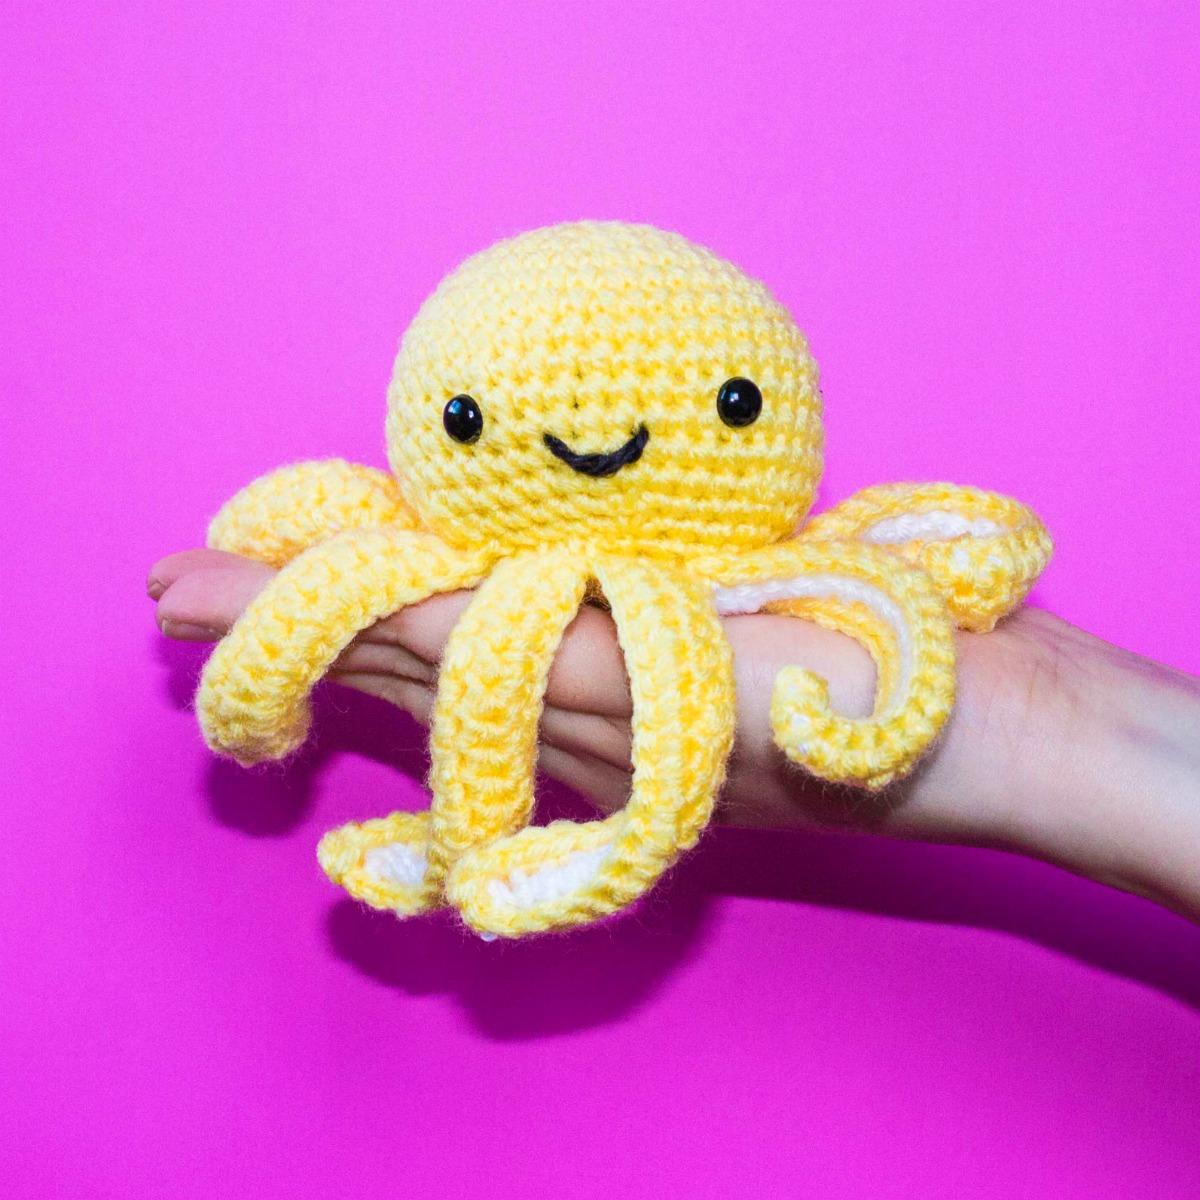 Free Crochet Pattern For Mini Octopus Thefriendlyredfox